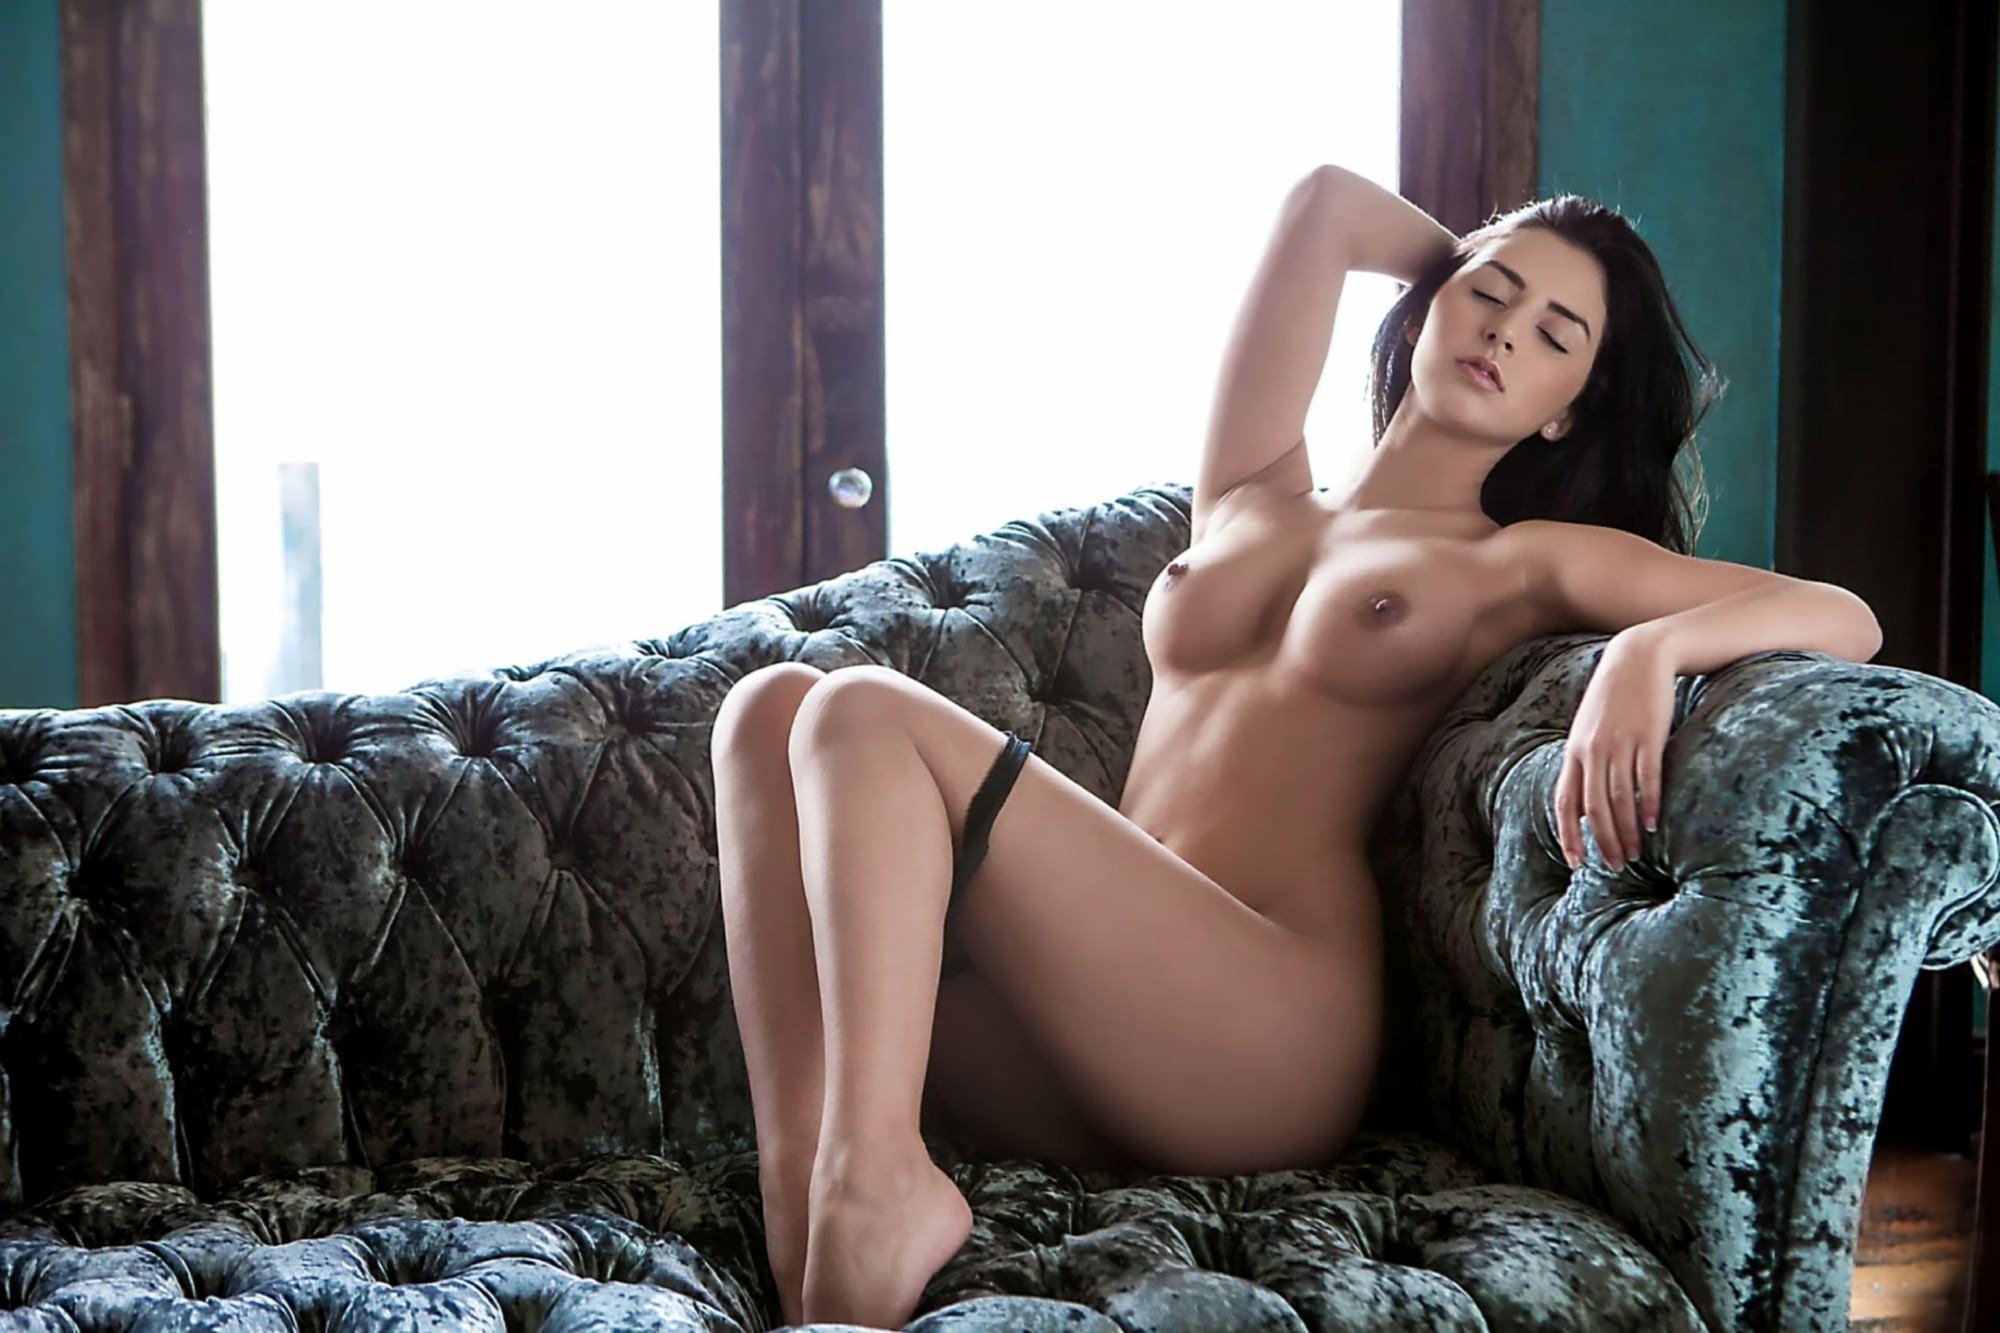 Why You'll Never Get A Kardashian Bum Doing Squats